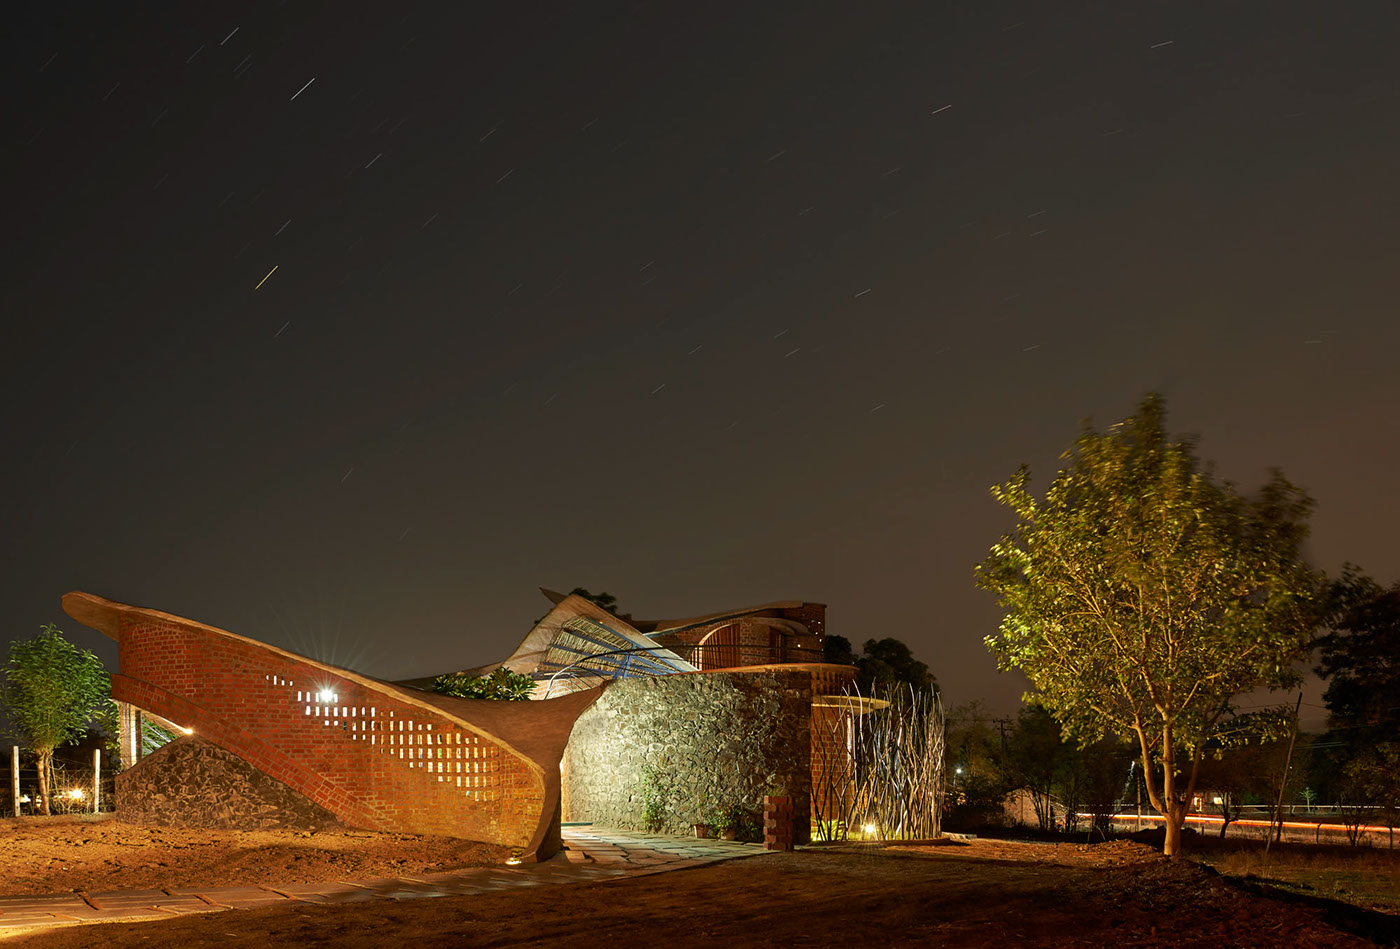 birck,arch,laurie baker,nari gandhi,stone,curved,organic architecture,design